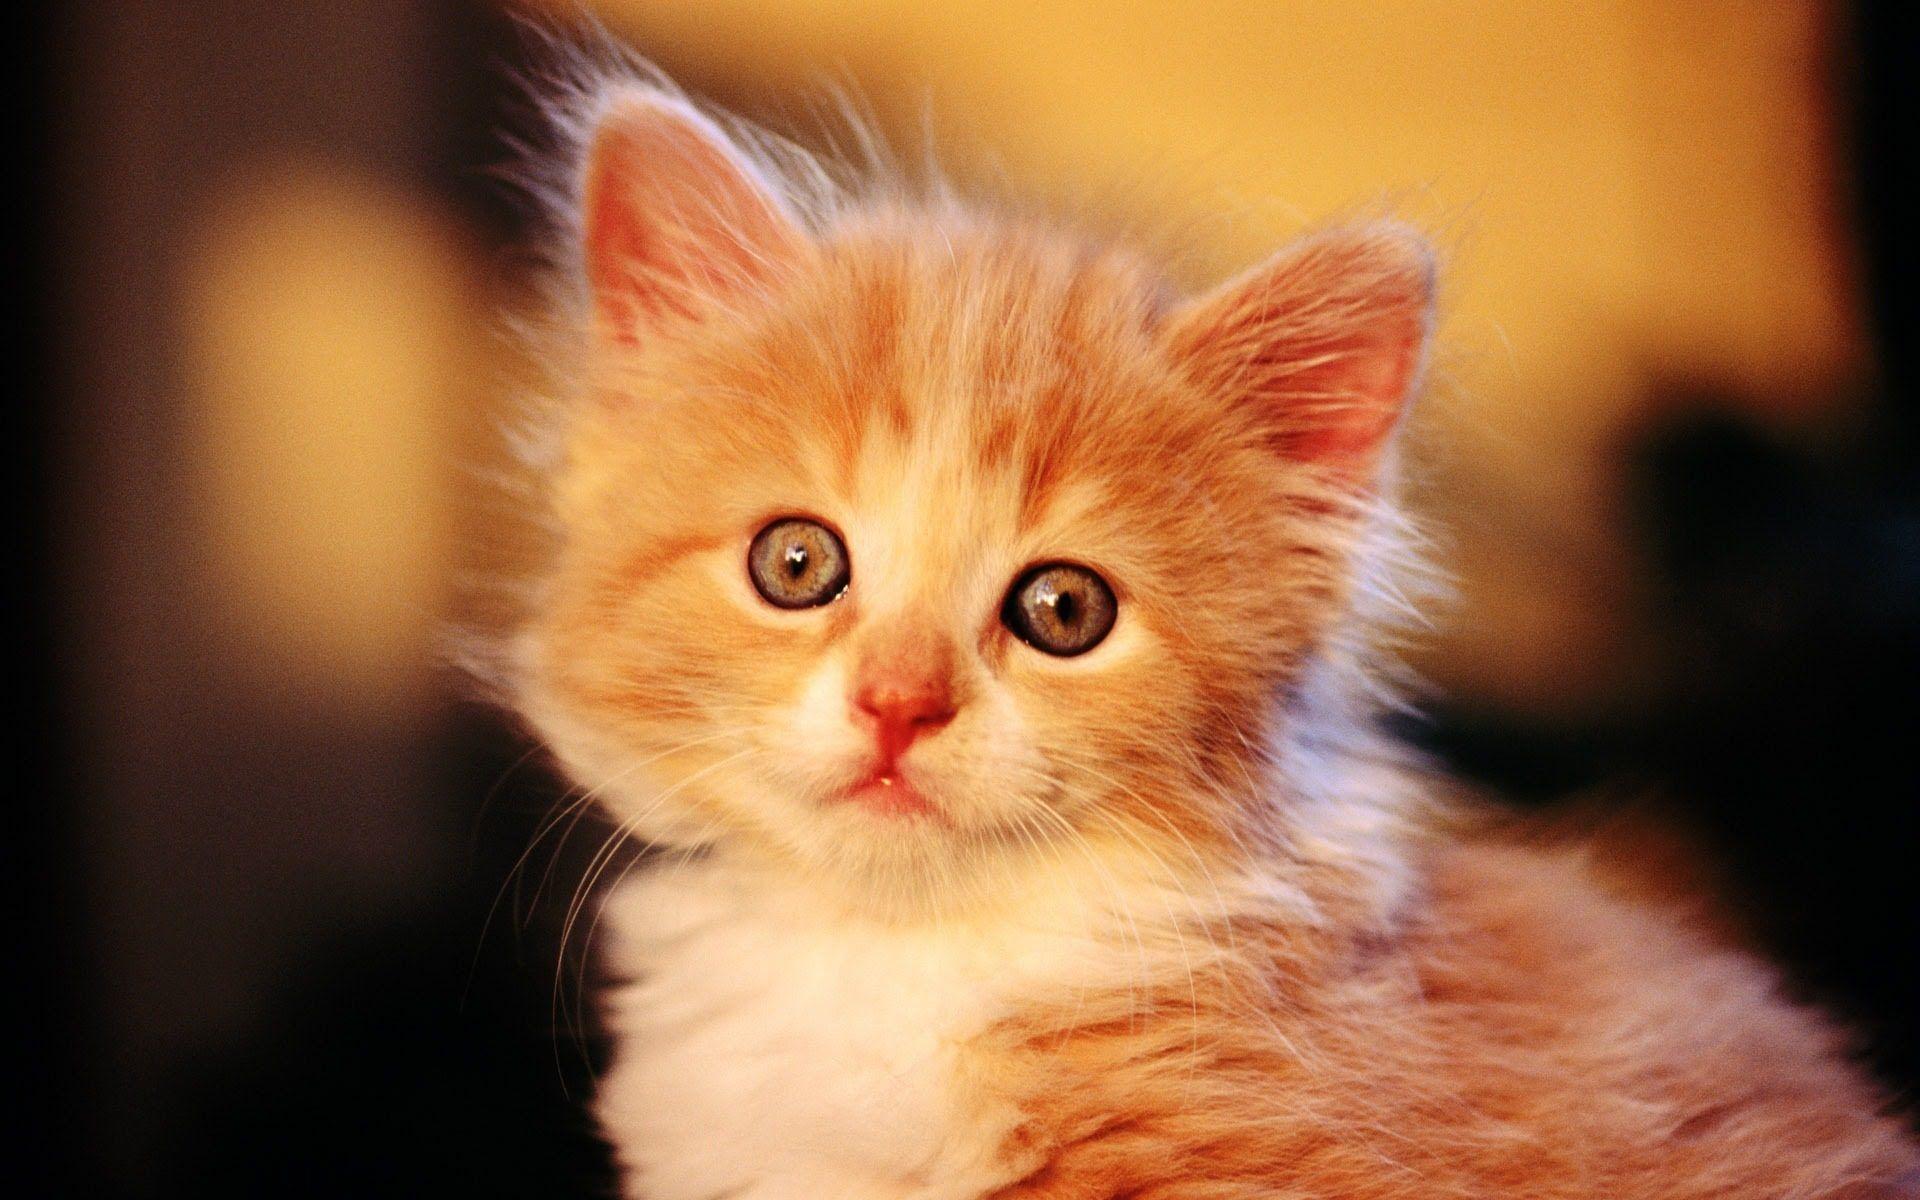 Best Cute Kittens Cats Video TOP 10 pilation 2015 NEW Too Cute